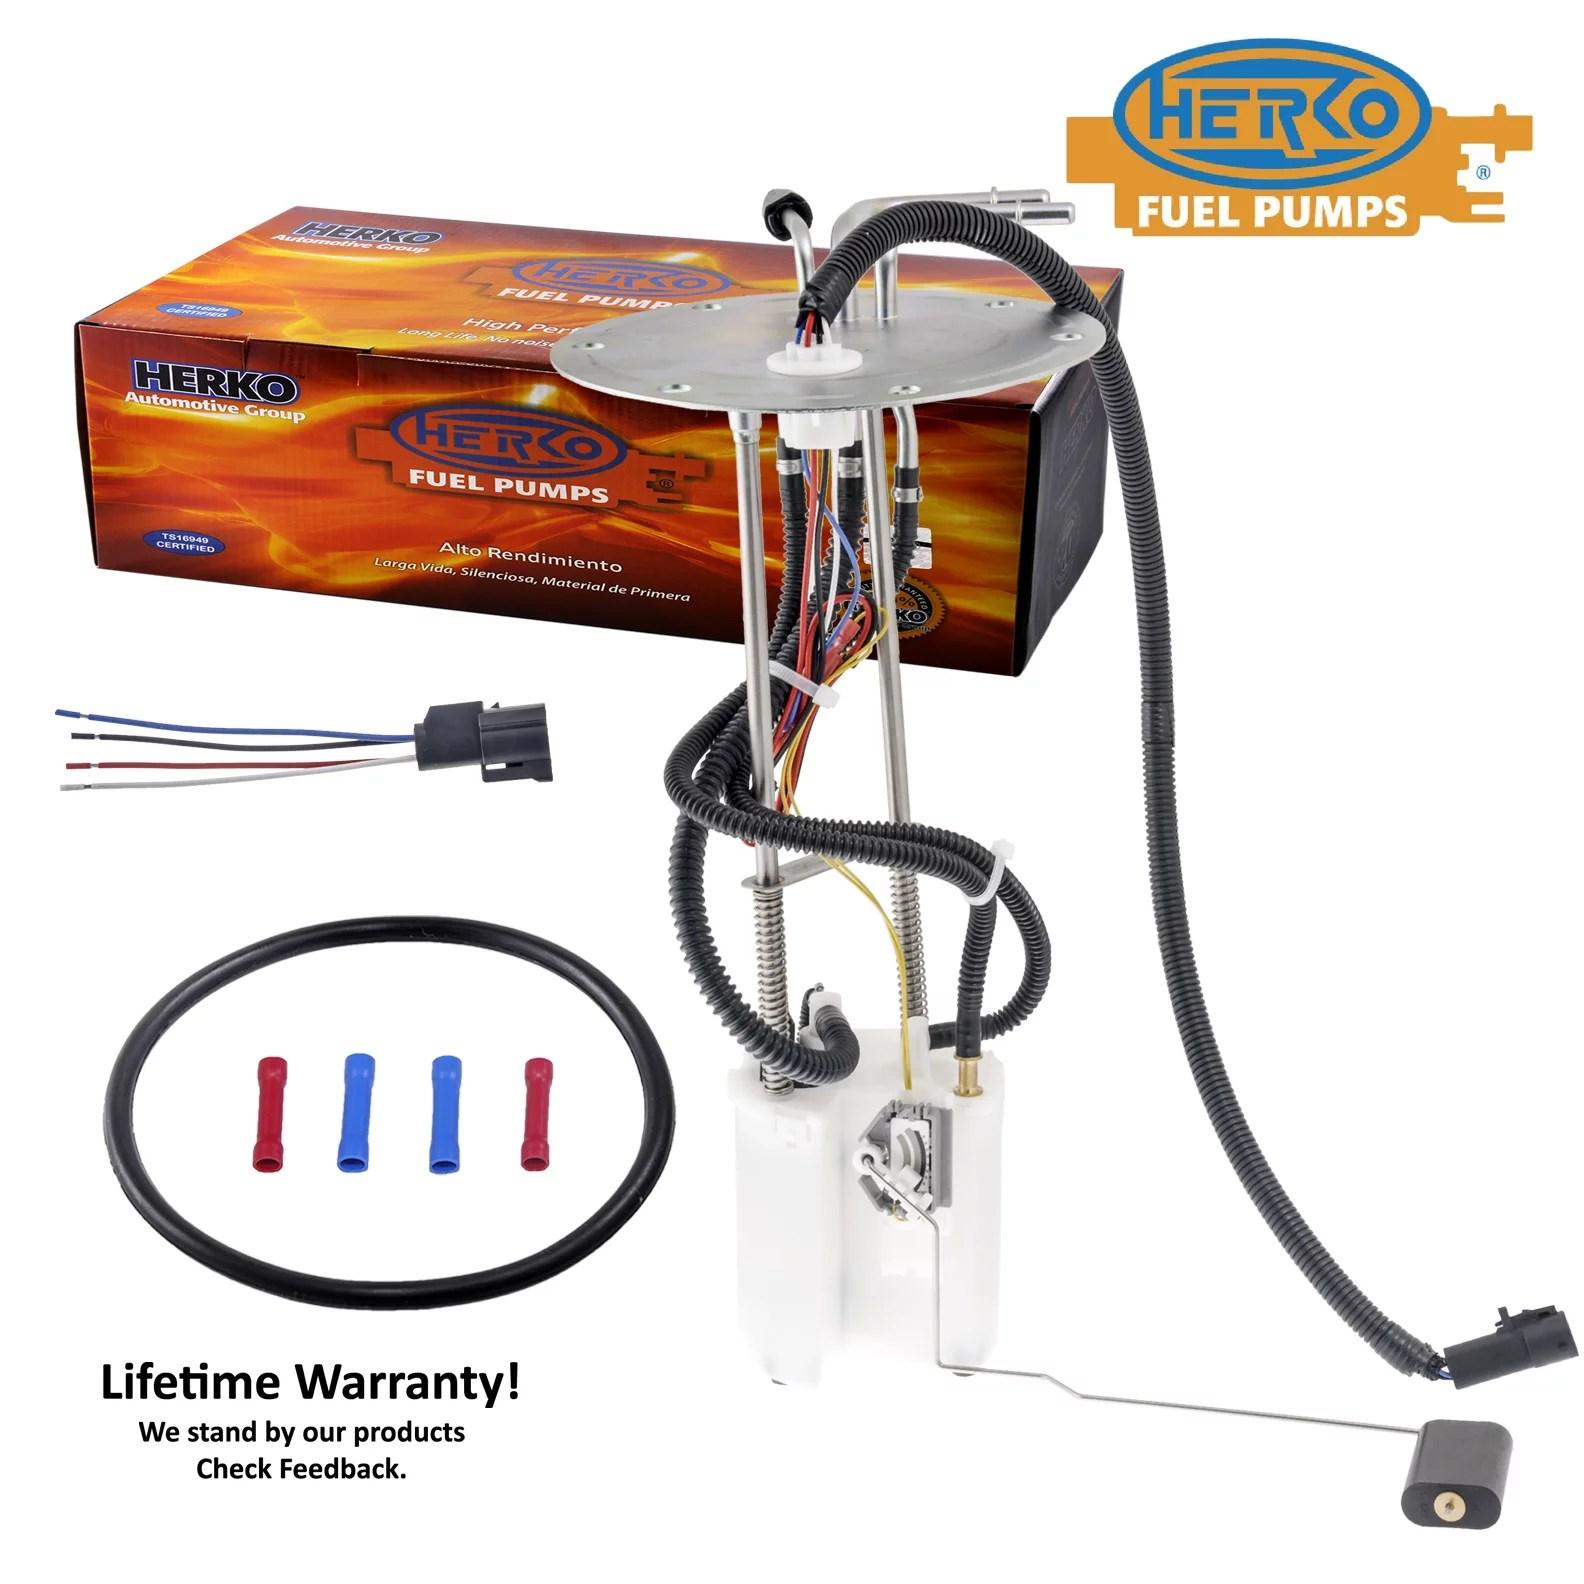 hight resolution of herko fuel pump 417ge for ford econoline e150 e250 e350 4 9l 5 8l ford crown victoria fuel pump 92 ford e 150 fuel pump wiring